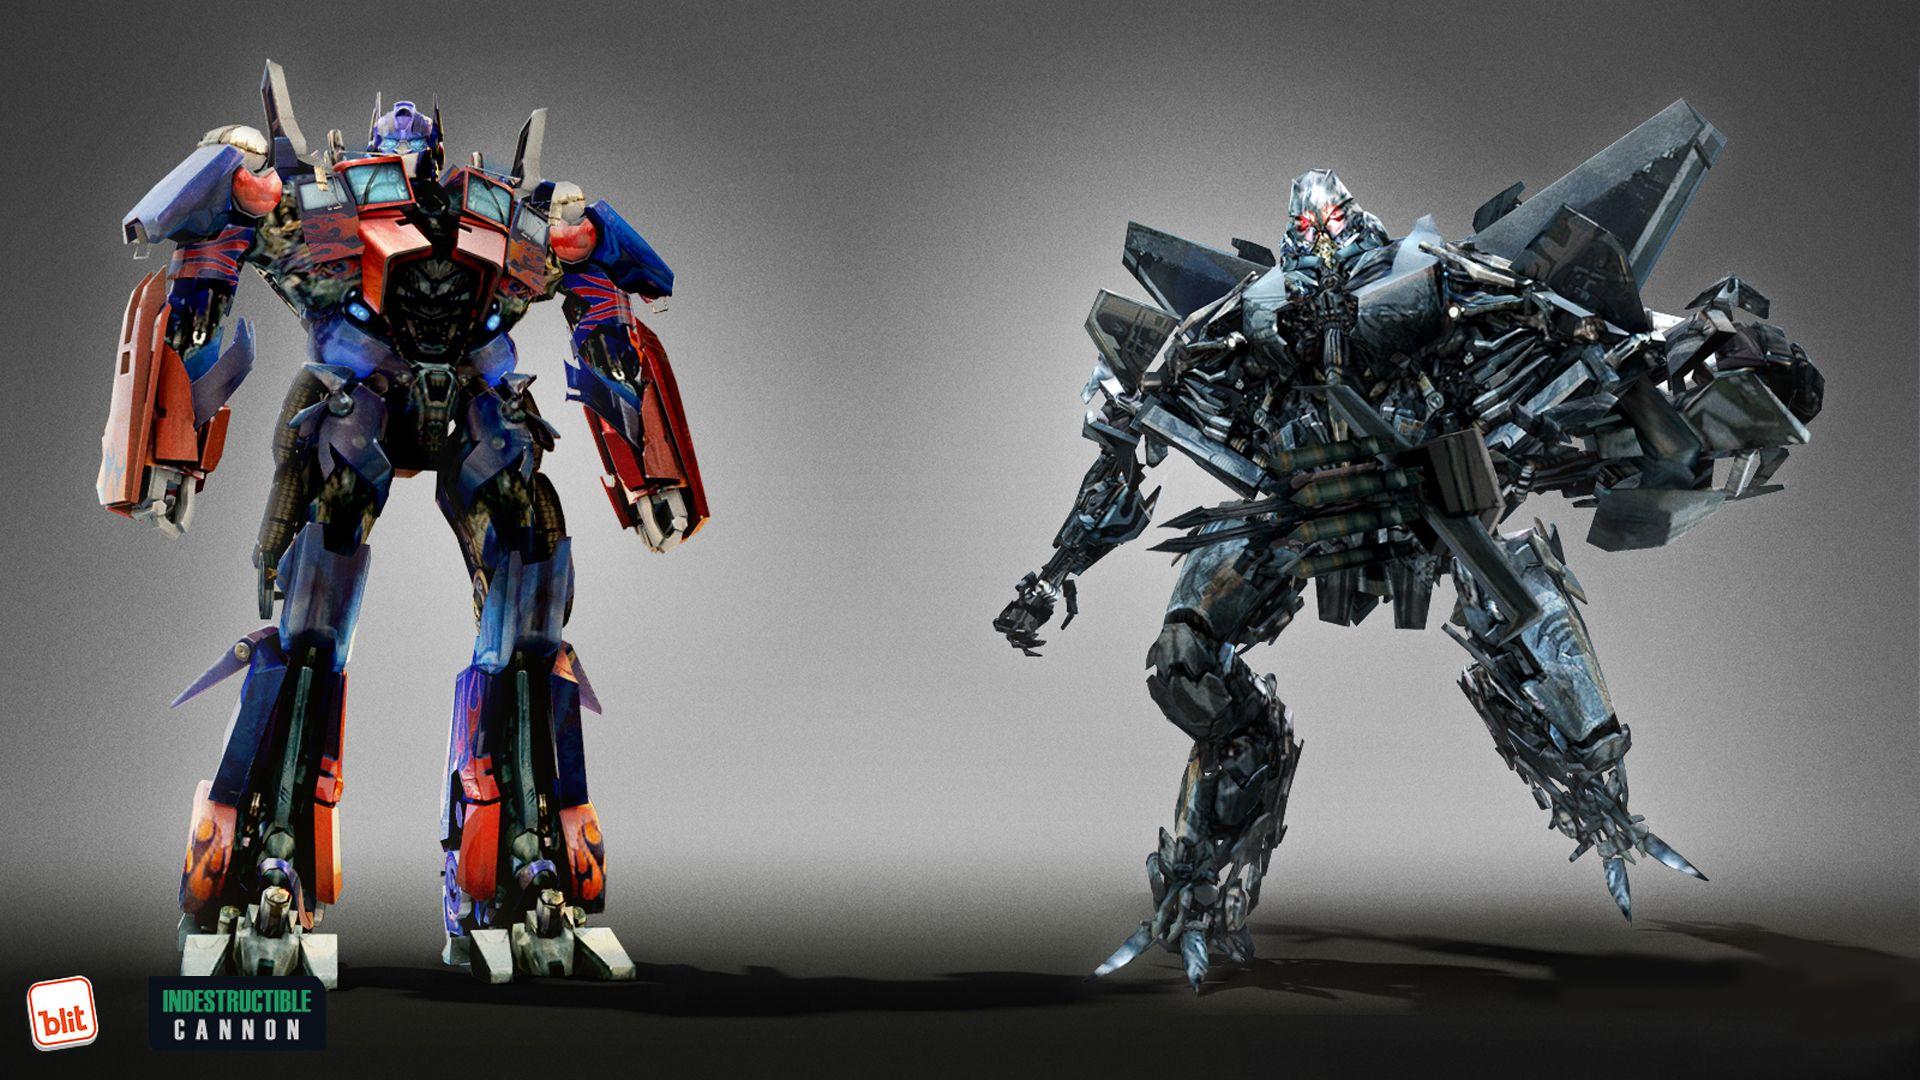 Transformers 3: Dark Of The Moon: Victory Is Sweet